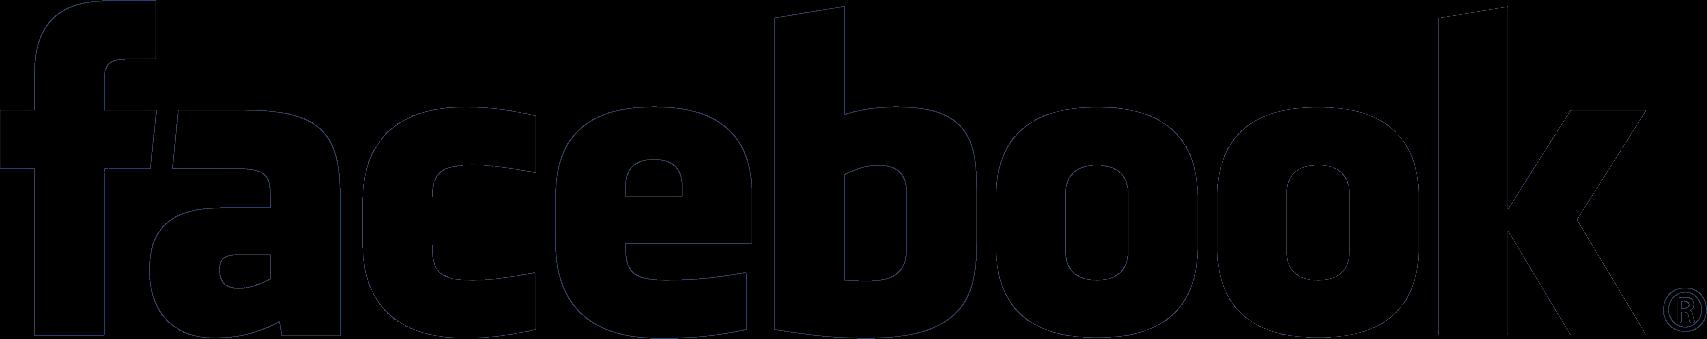 50-Best-Facebook-Logo-Icons-GIF-Transparent-PNG-Images-35